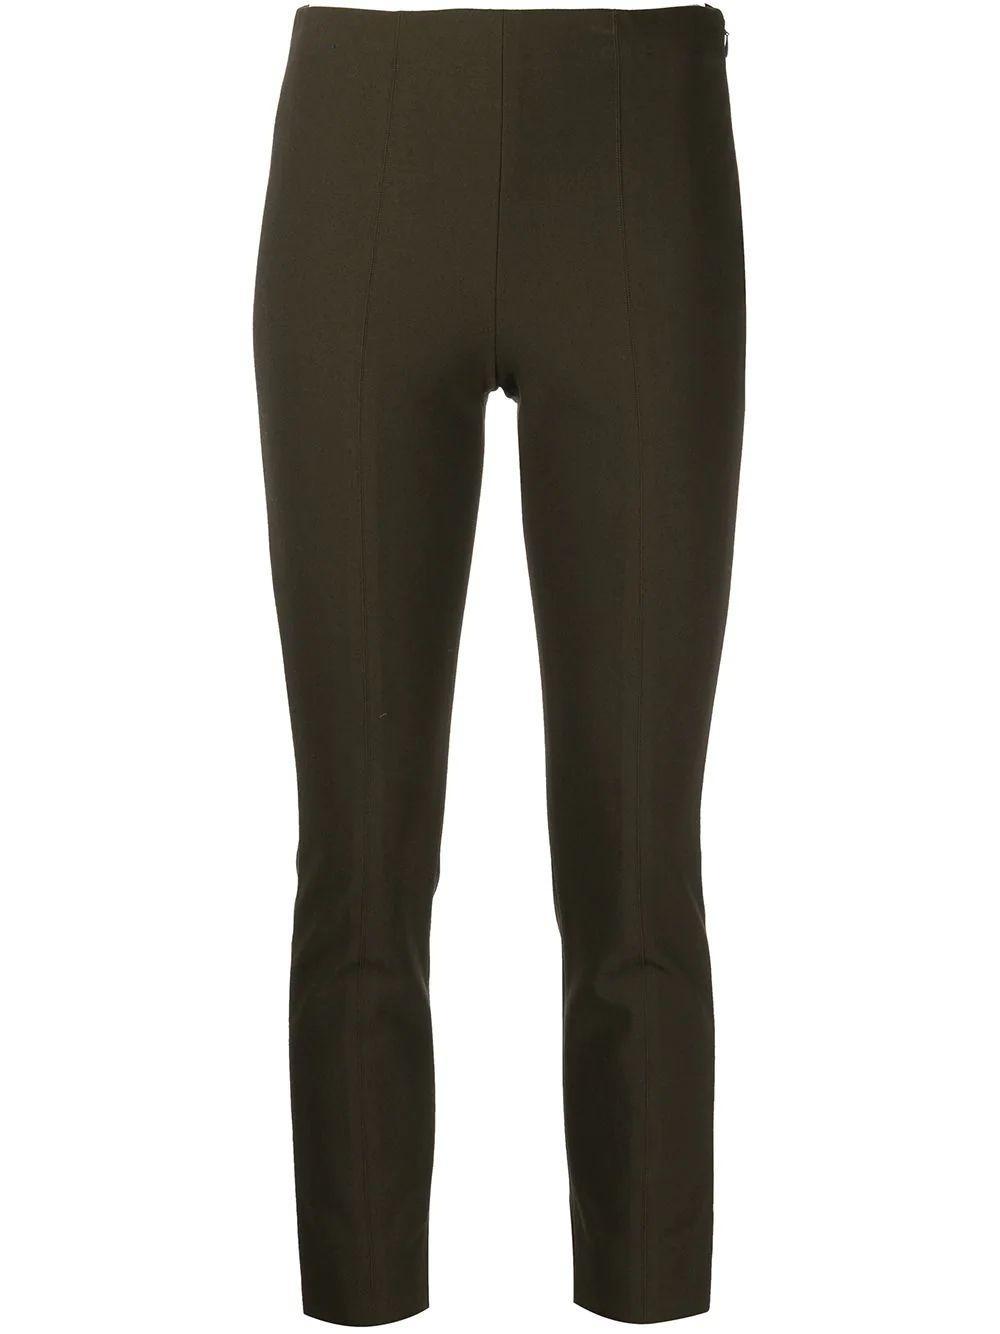 Stitch Front Seam Legging Item # V772621199